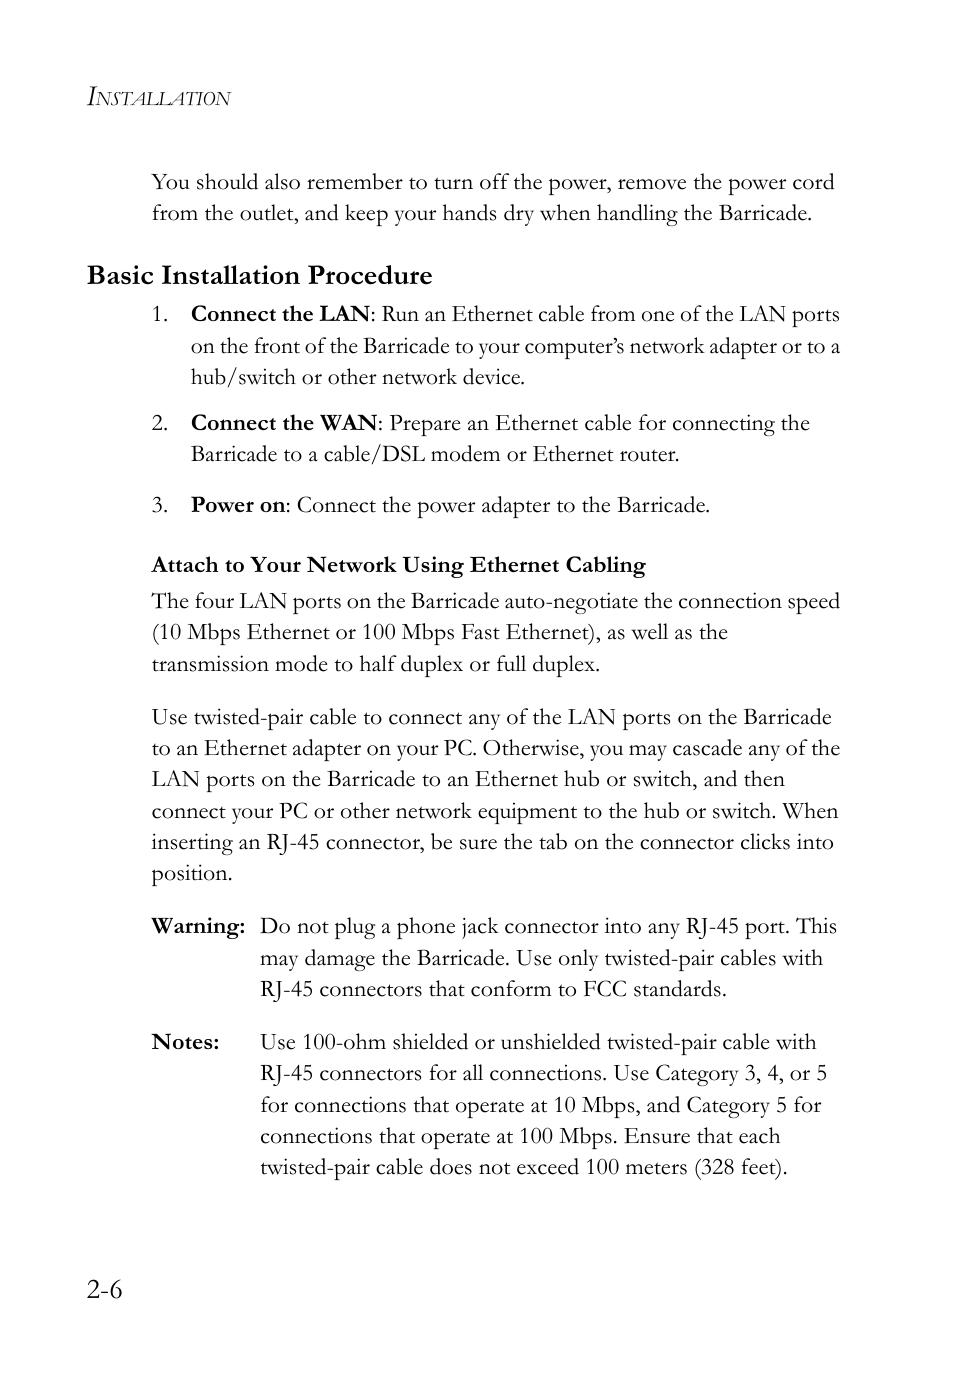 medium resolution of basic installation procedure smc networks smc barricade smc7004vbr user manual page 24 122